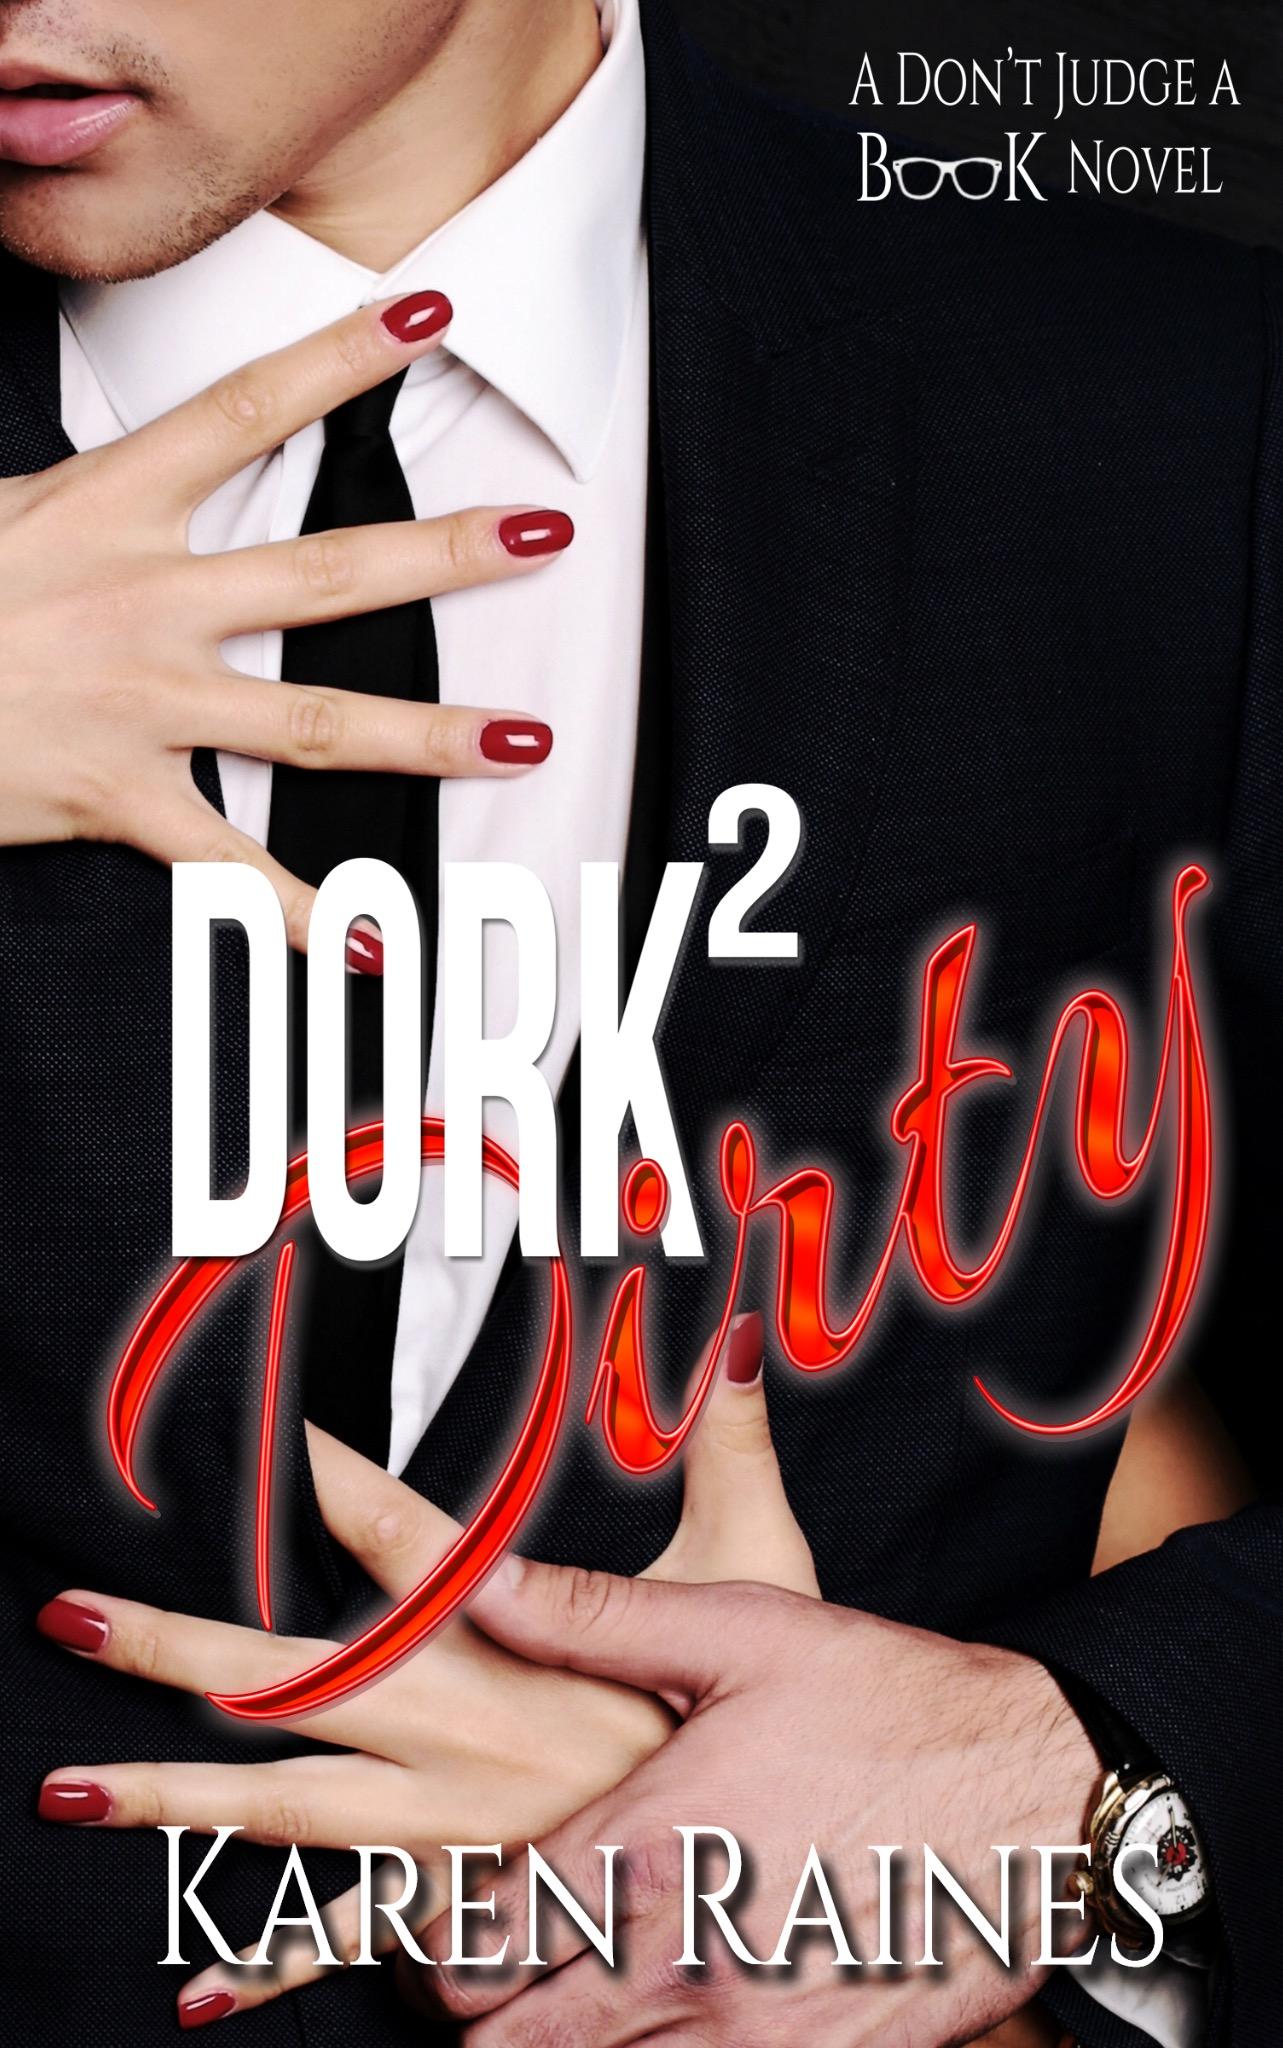 Dork 2 Dirty.ebook